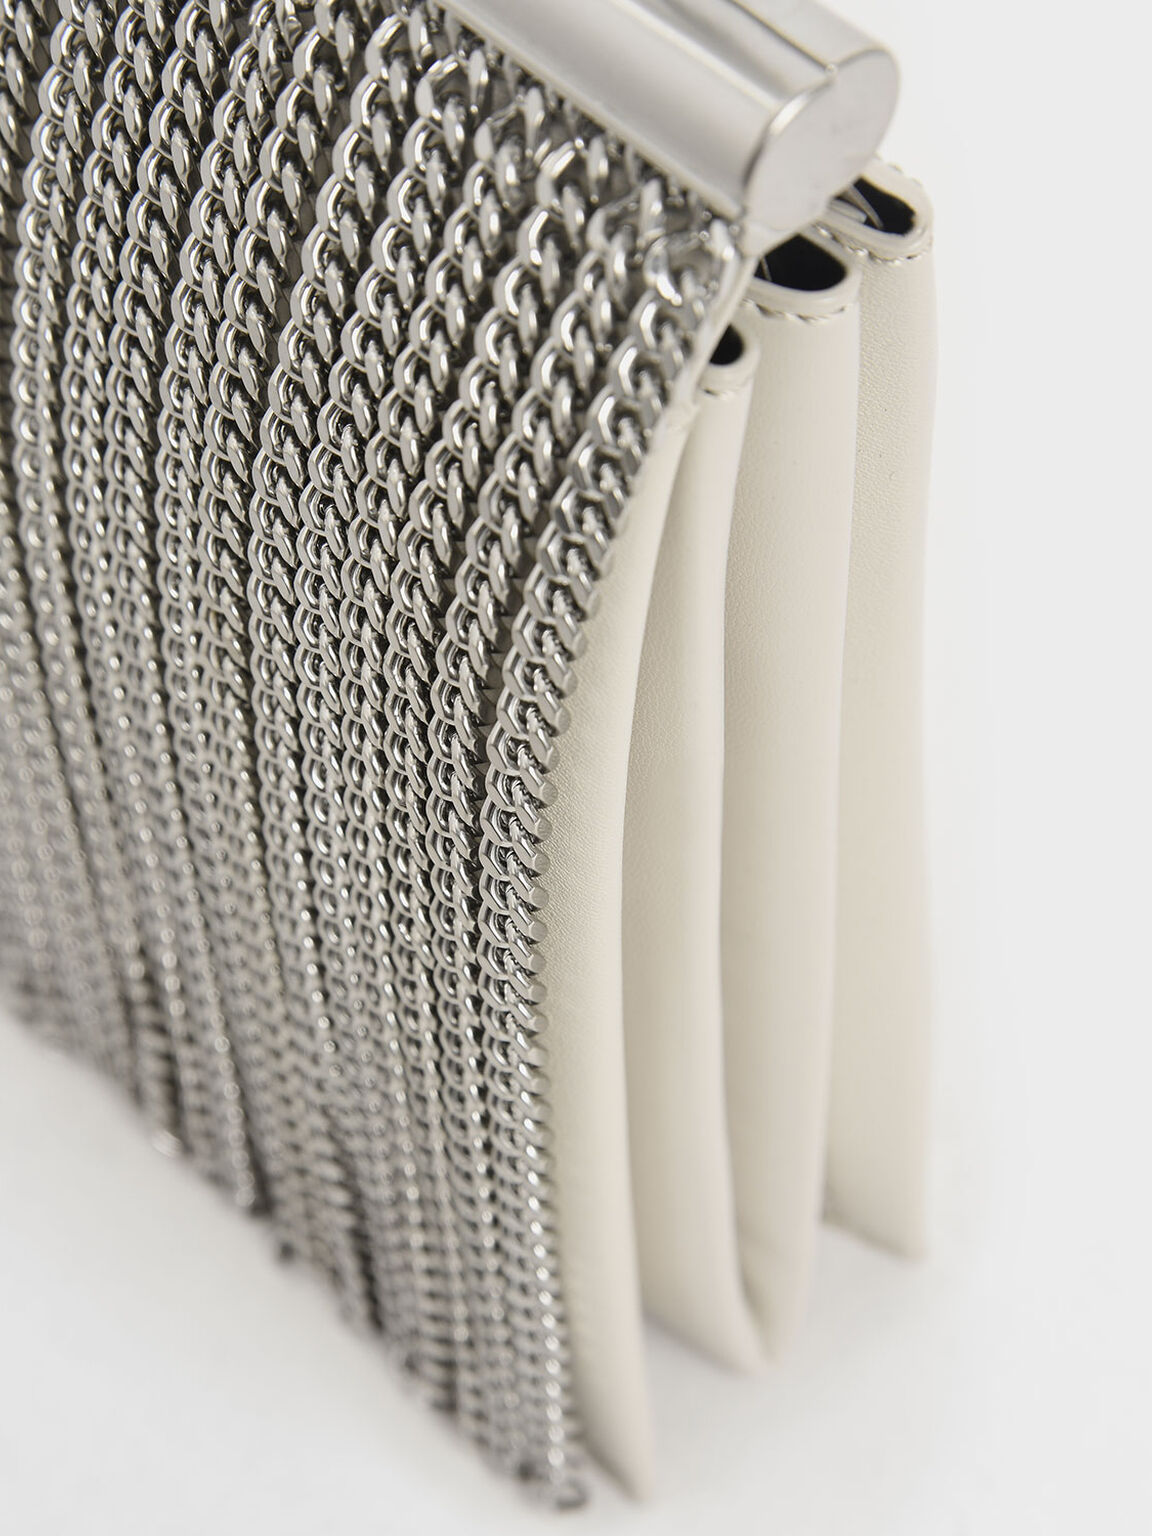 Chain Fringe Elongated Clutch, Cream, hi-res